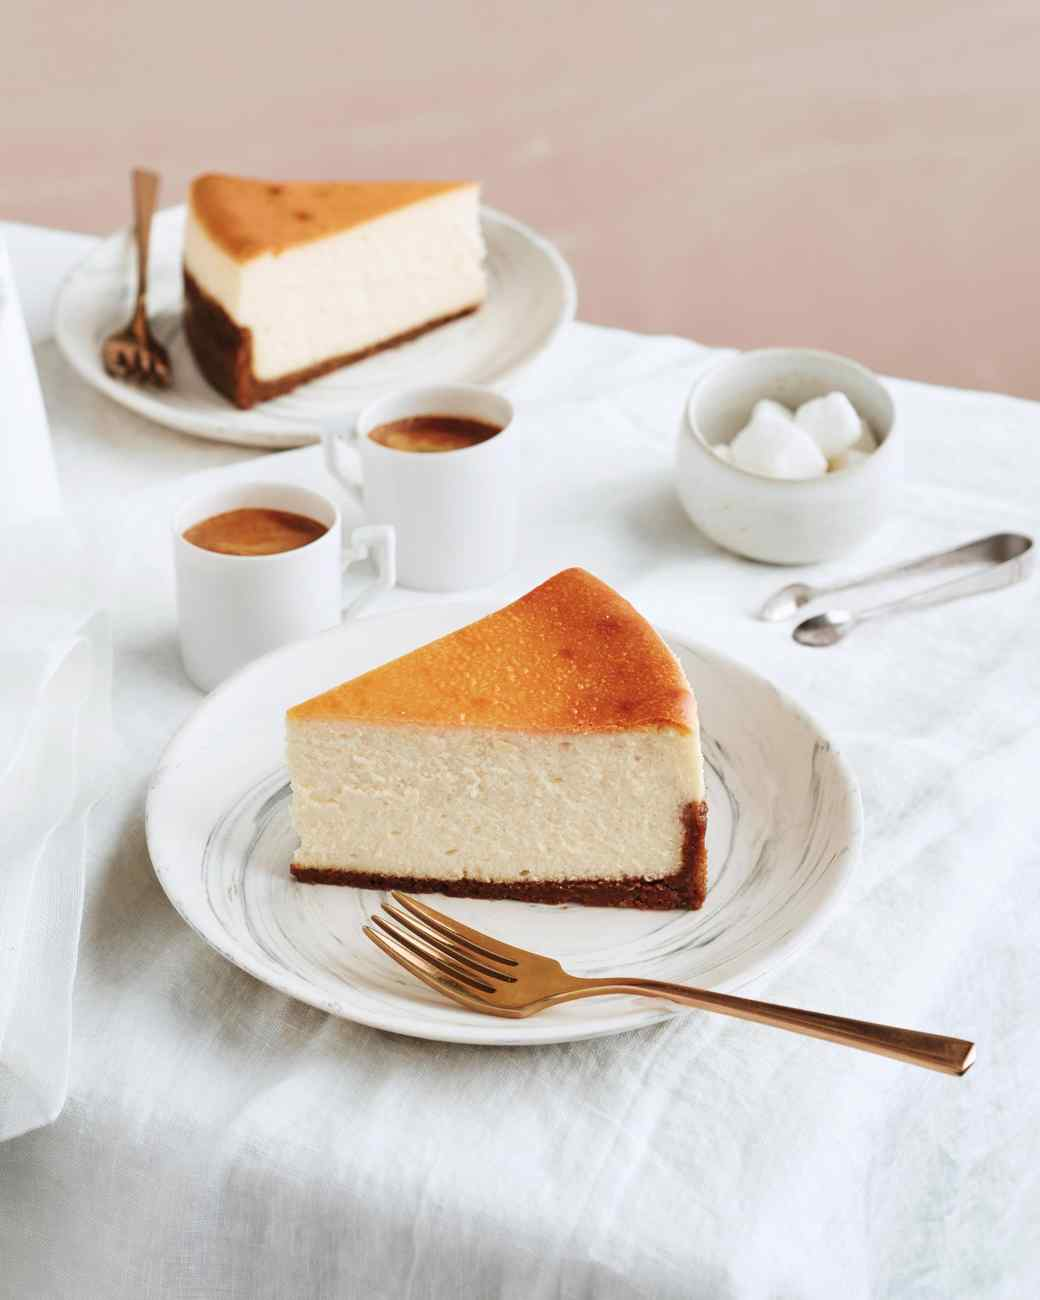 cheesecake-beauty-3-192-exp2-d112638.jpg